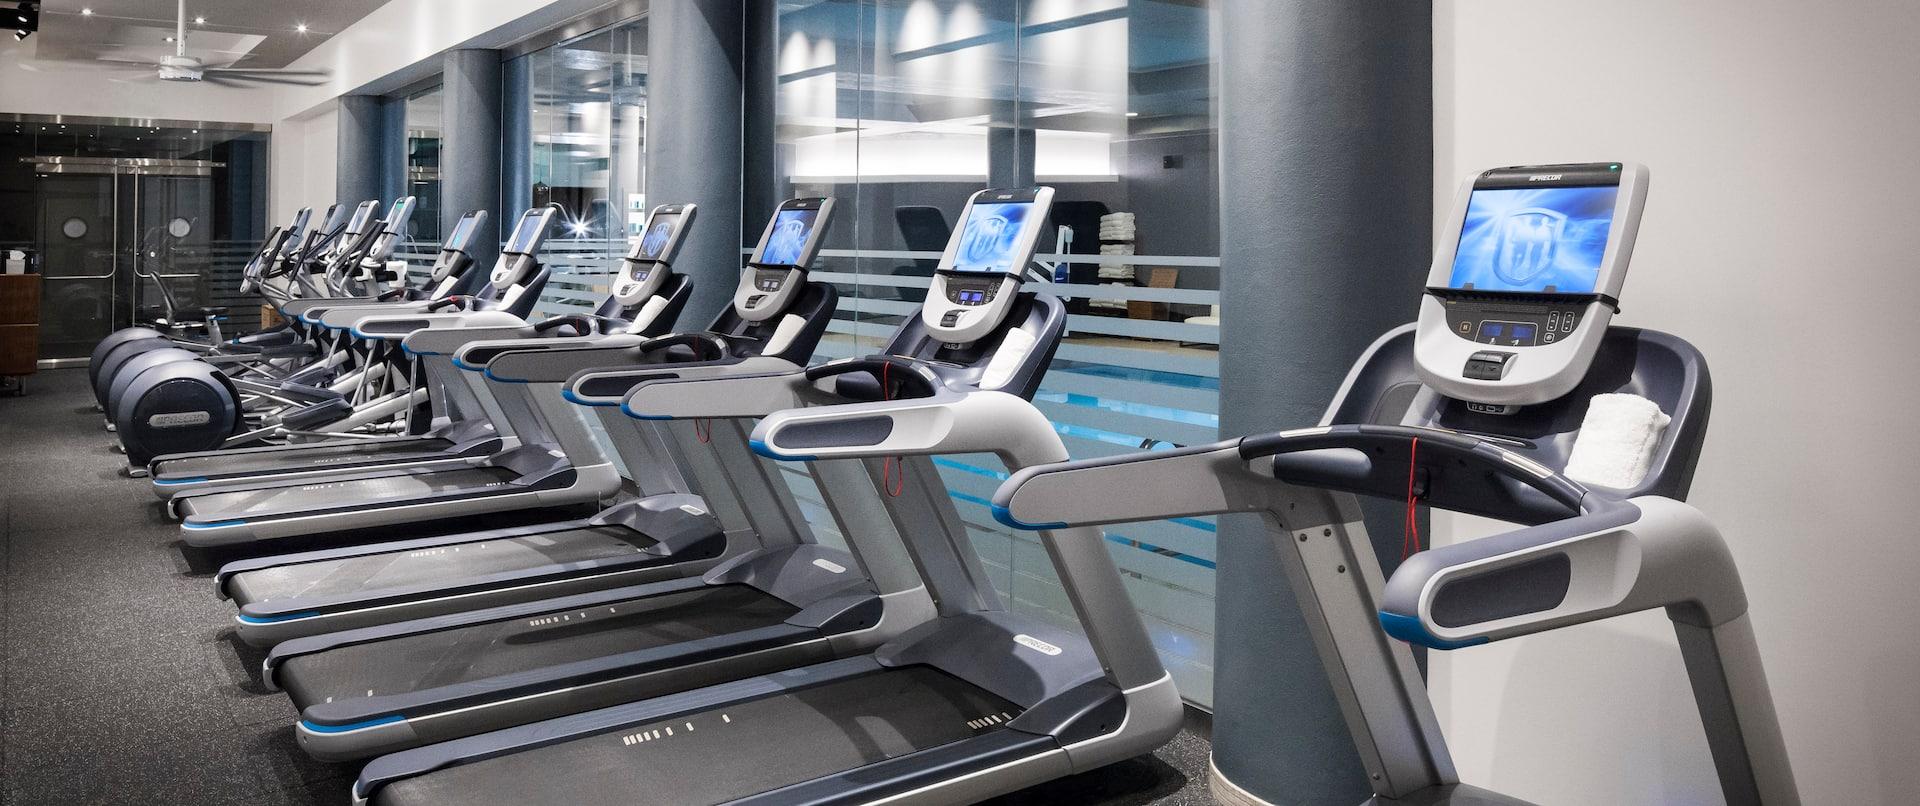 Spa Fitness Cardio